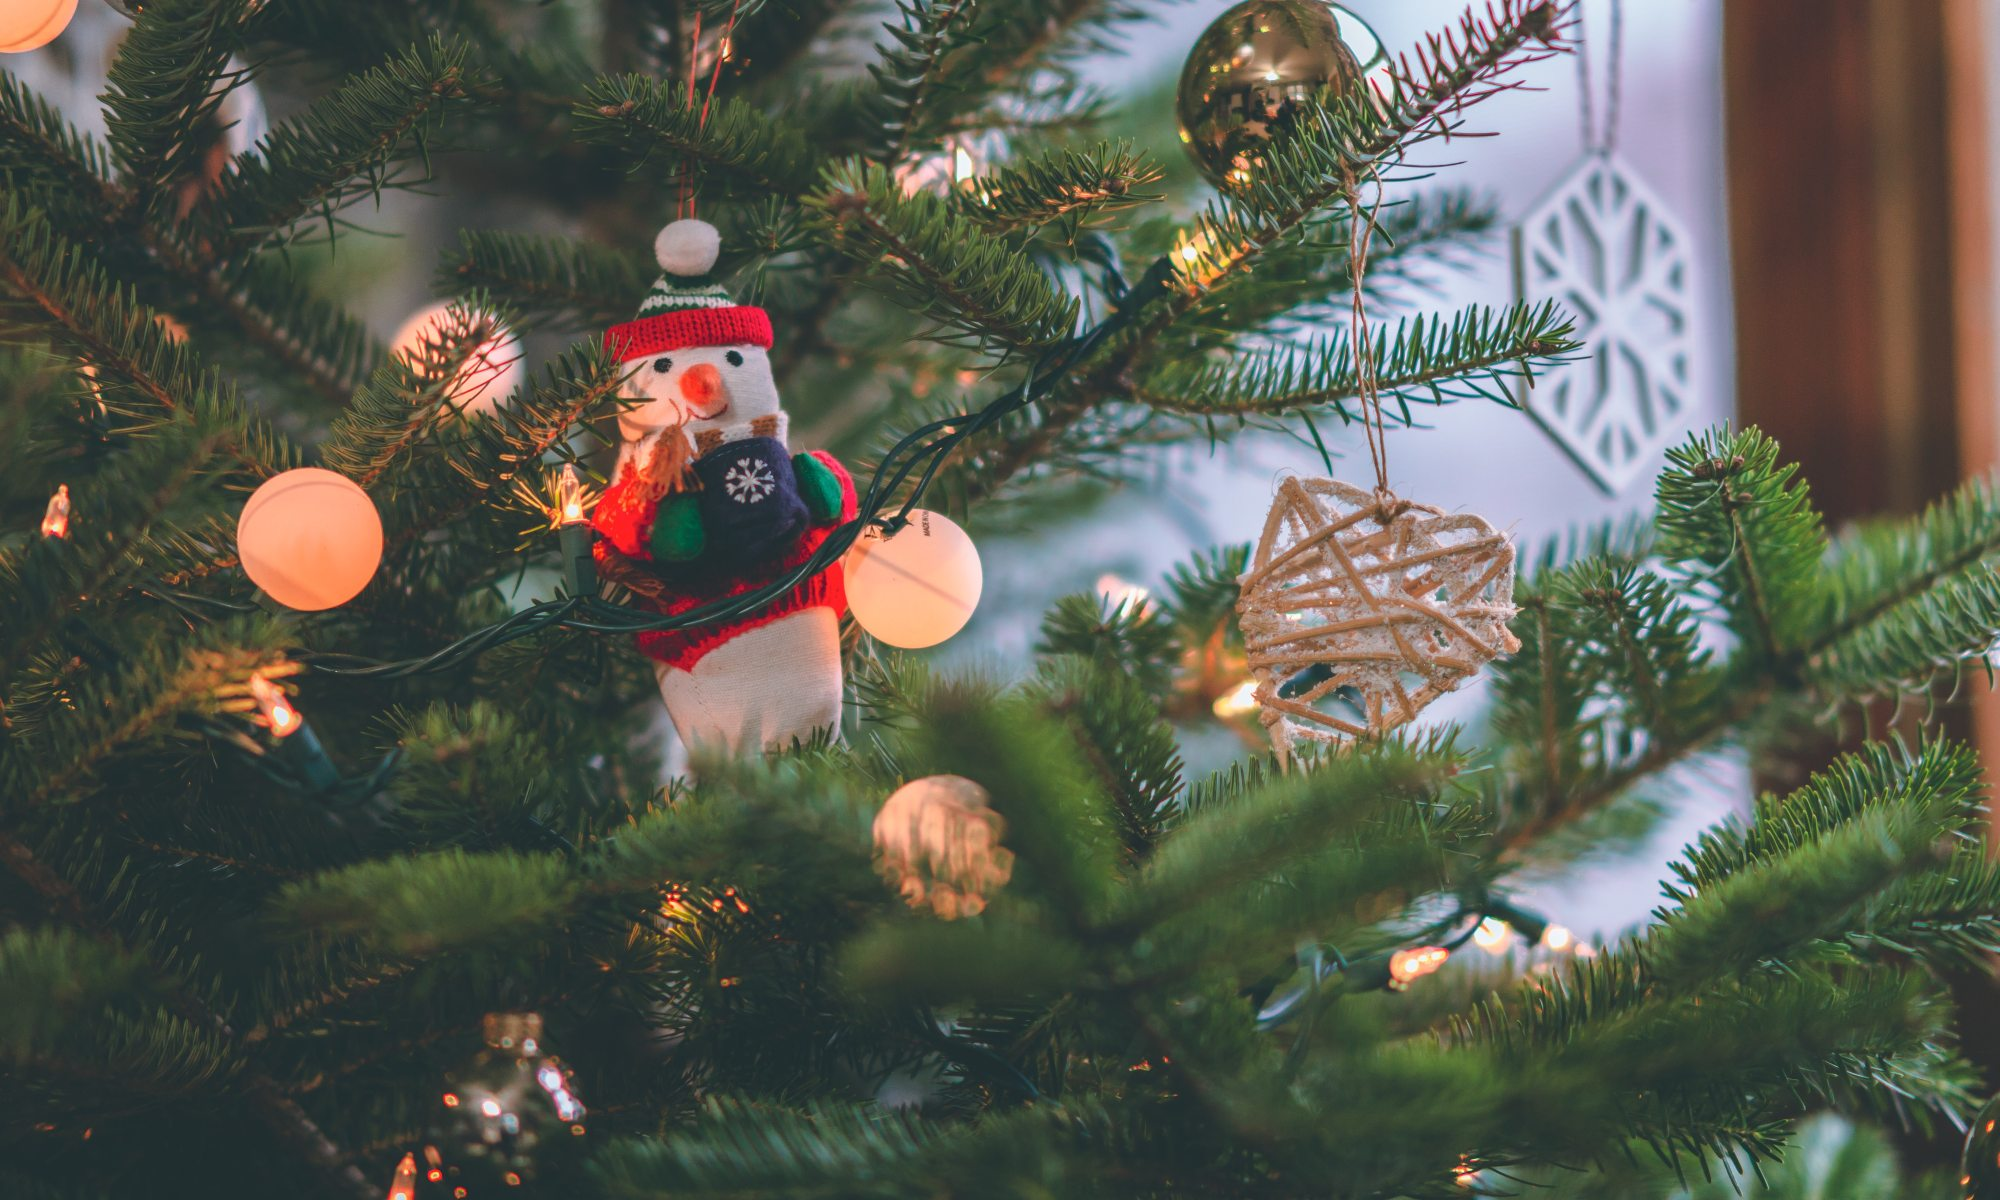 Close-up of a Christmas ornament